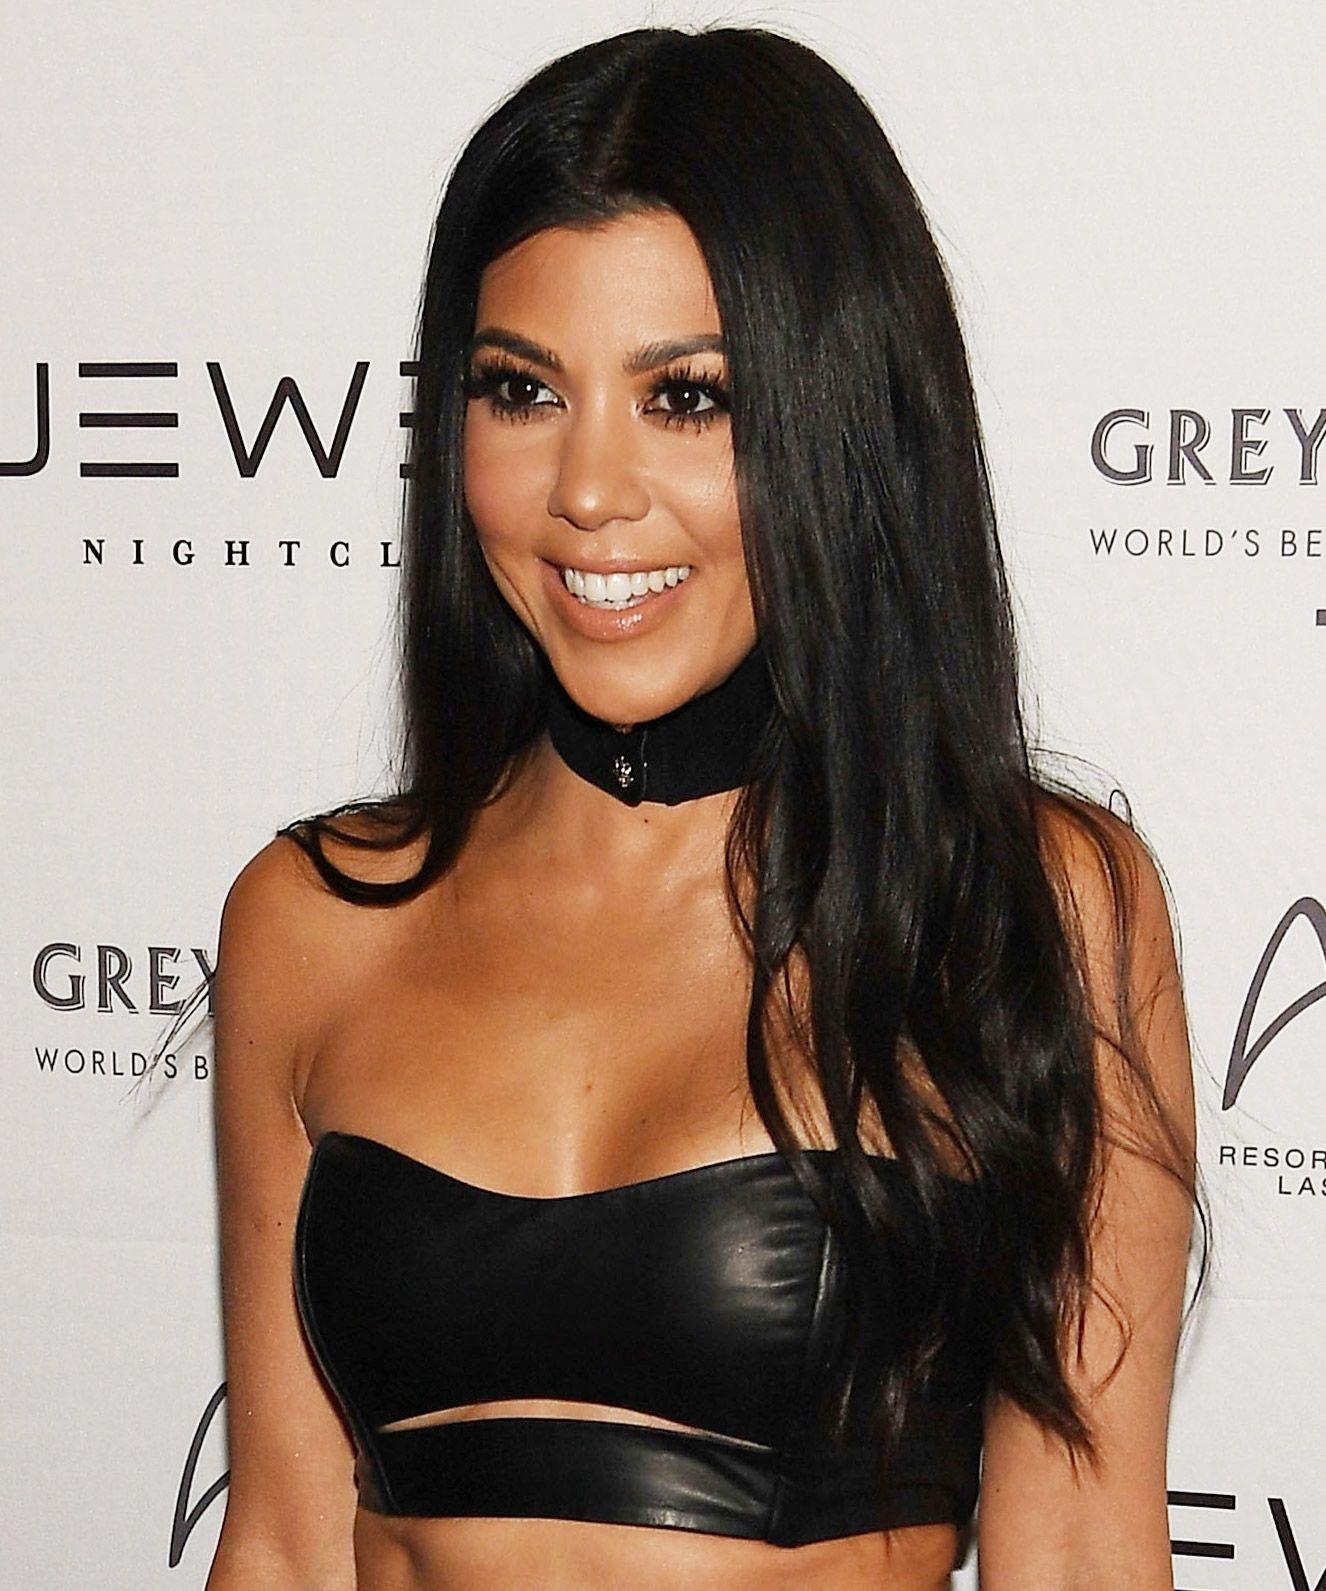 Kourtney Kardashian Serves Up Major Fitspo and Travel Envy in a